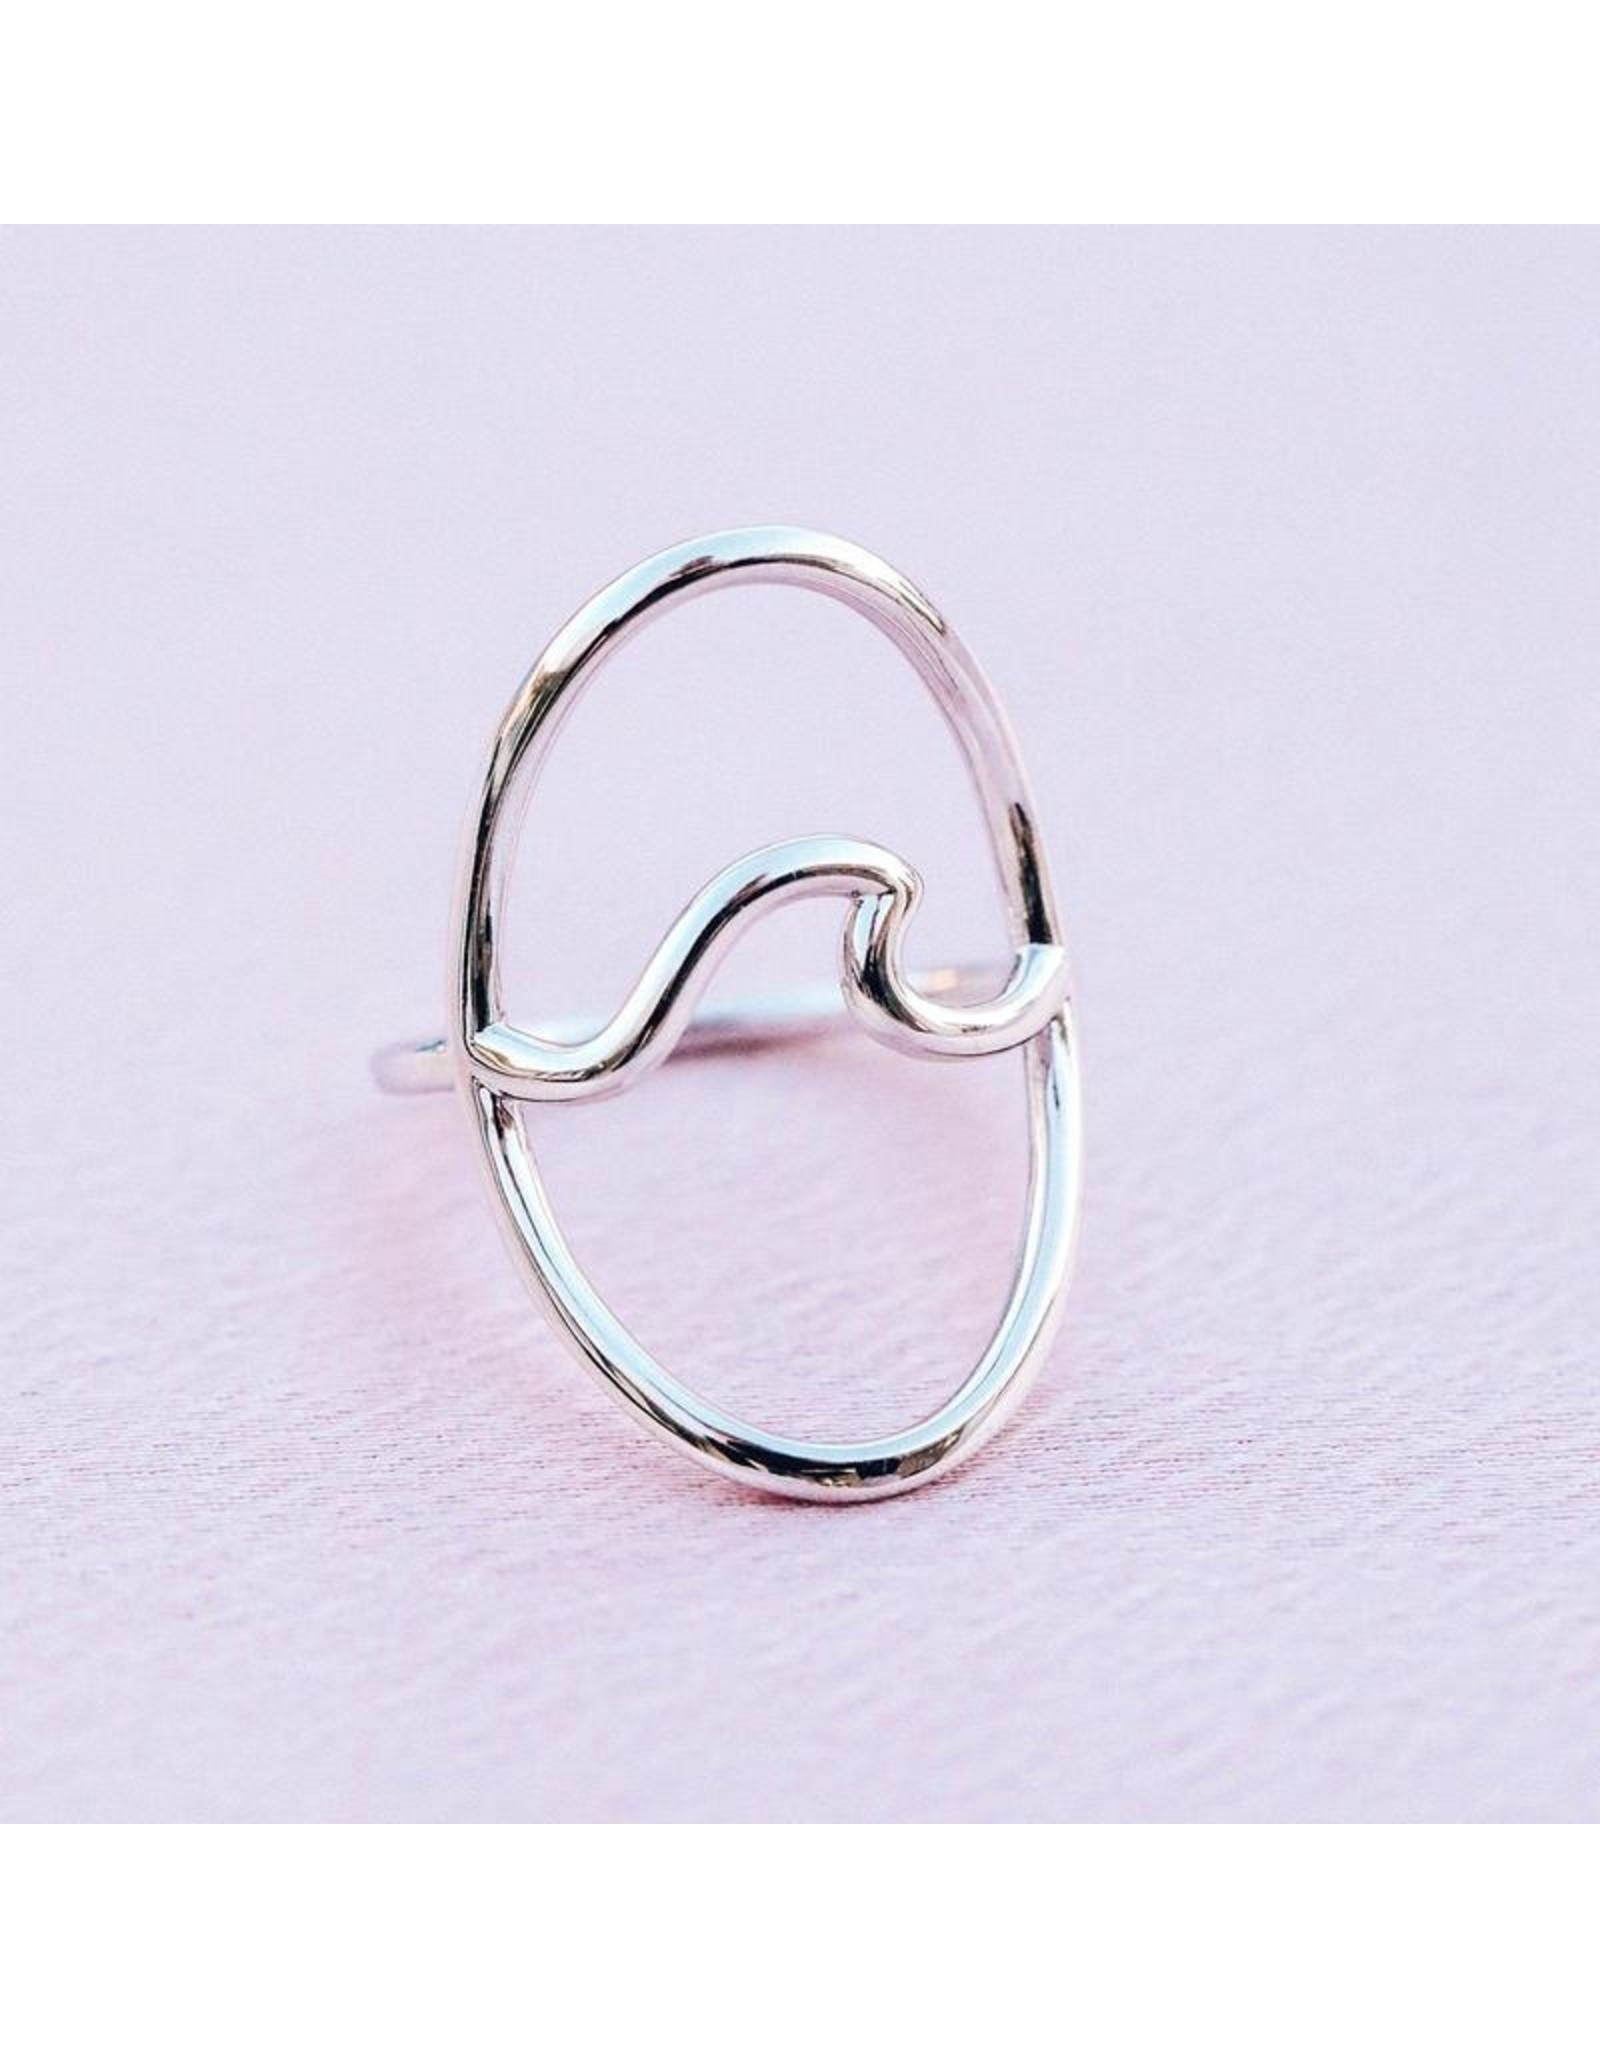 Pura Vida Statement Oversized Wave Ring, Silver